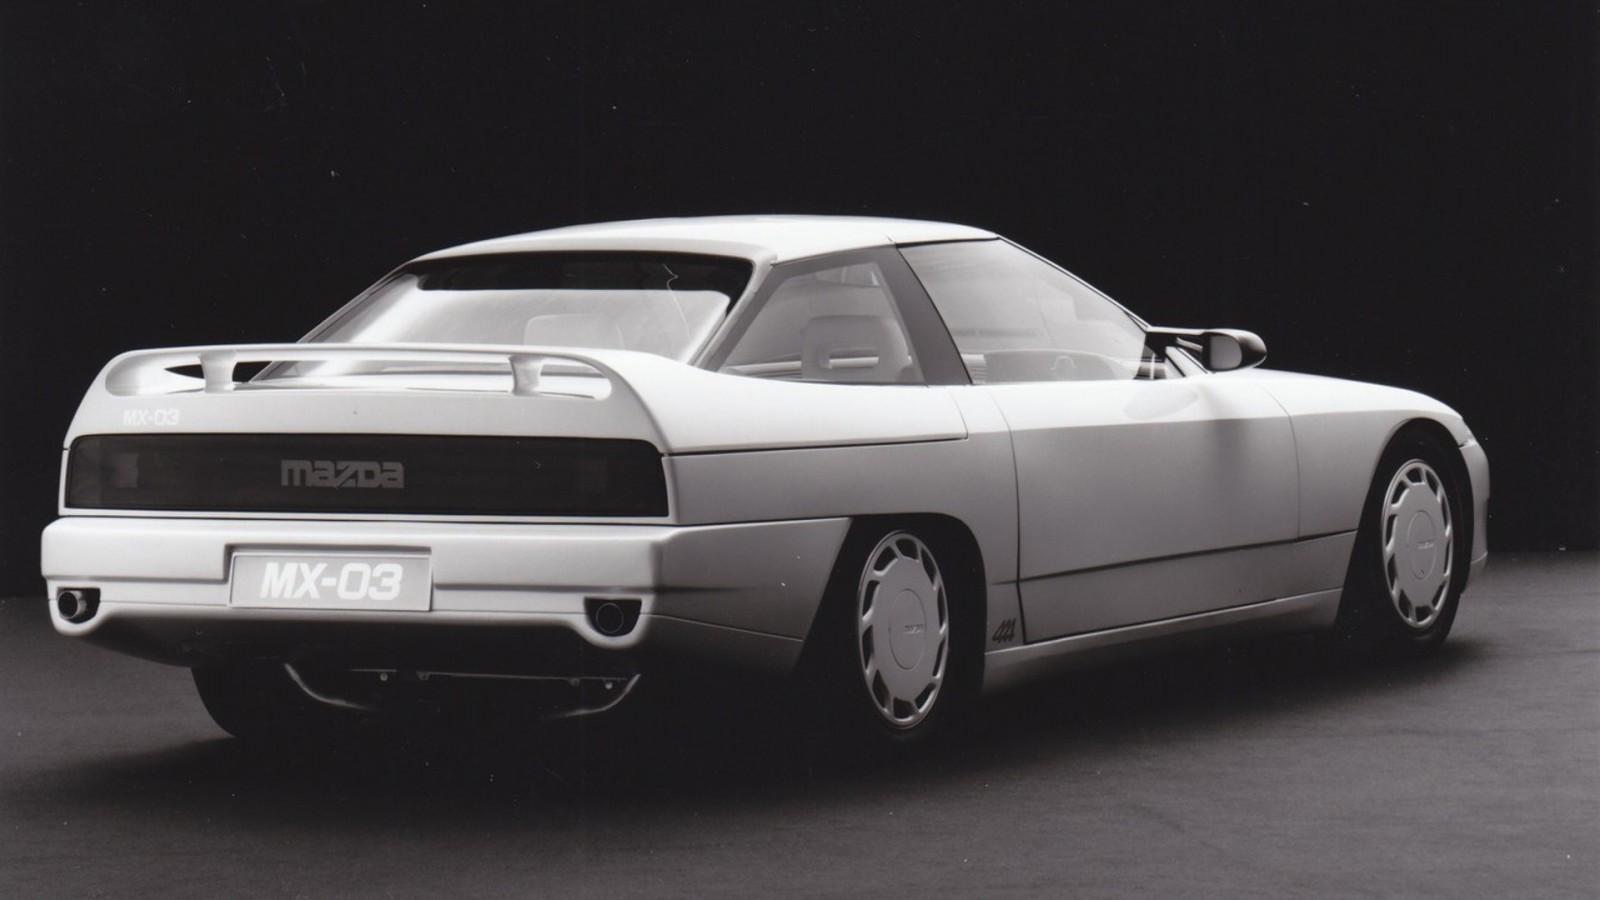 1985-mazda-mx-03-concept8